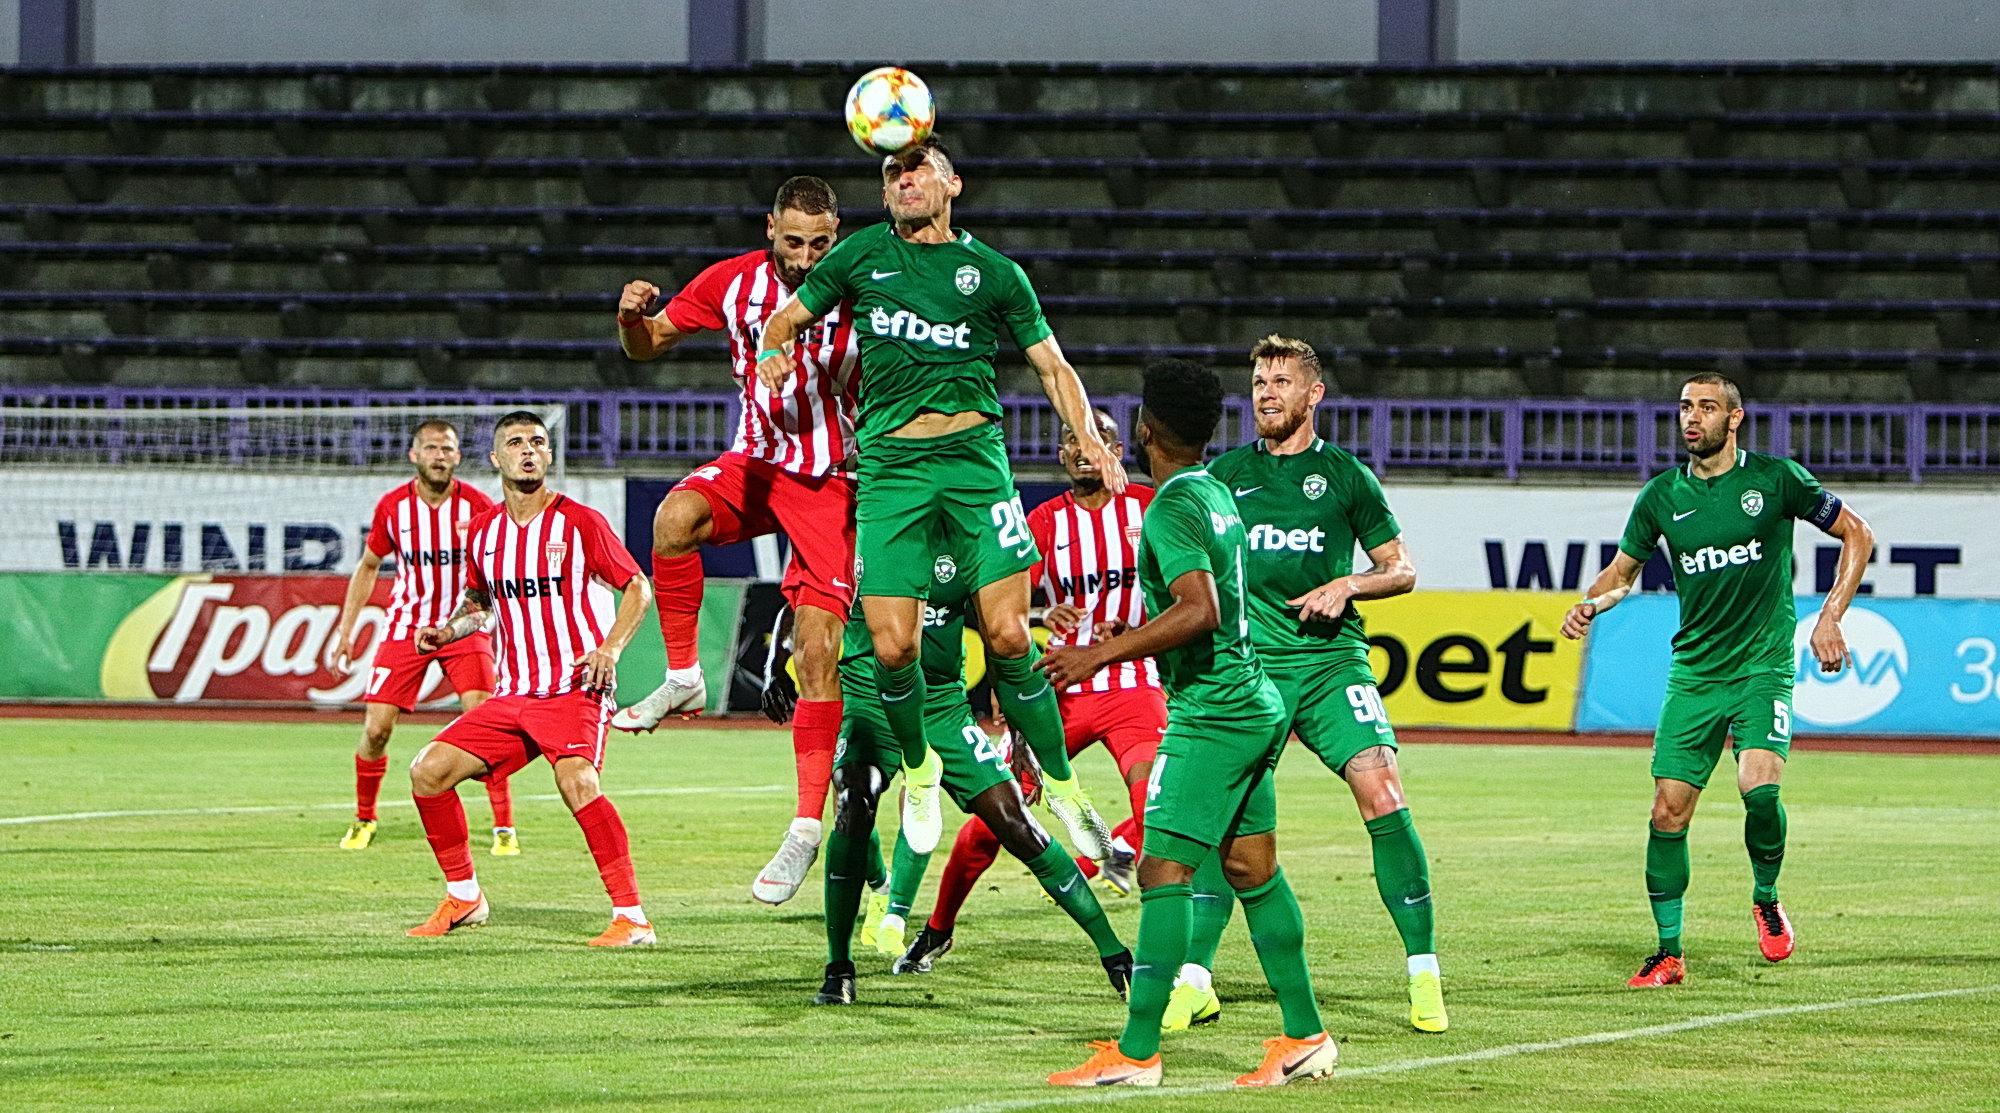 Prognoza za Ludogorets-Maribor Betinum.com